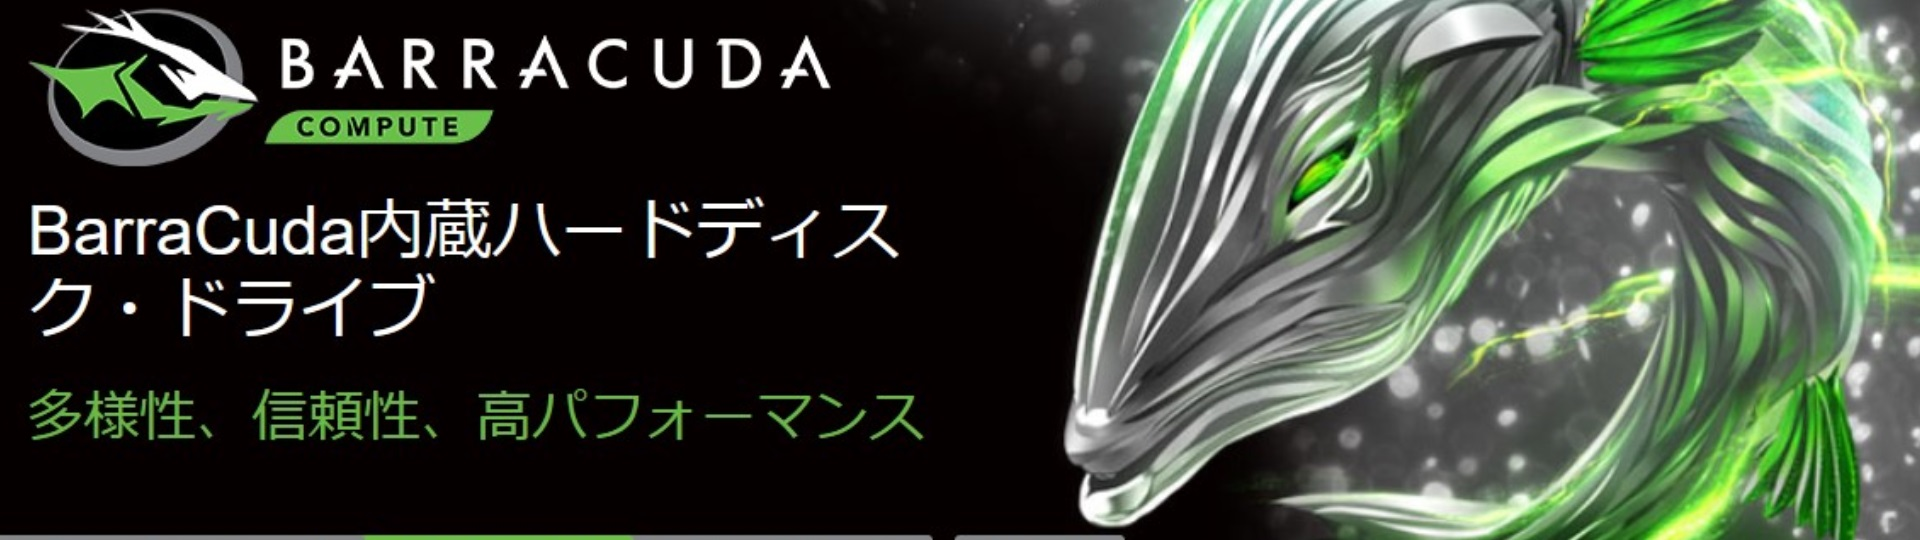 AviUtlにオススメPCスペック:HDD Seagate BarraCuda ST4000DM004